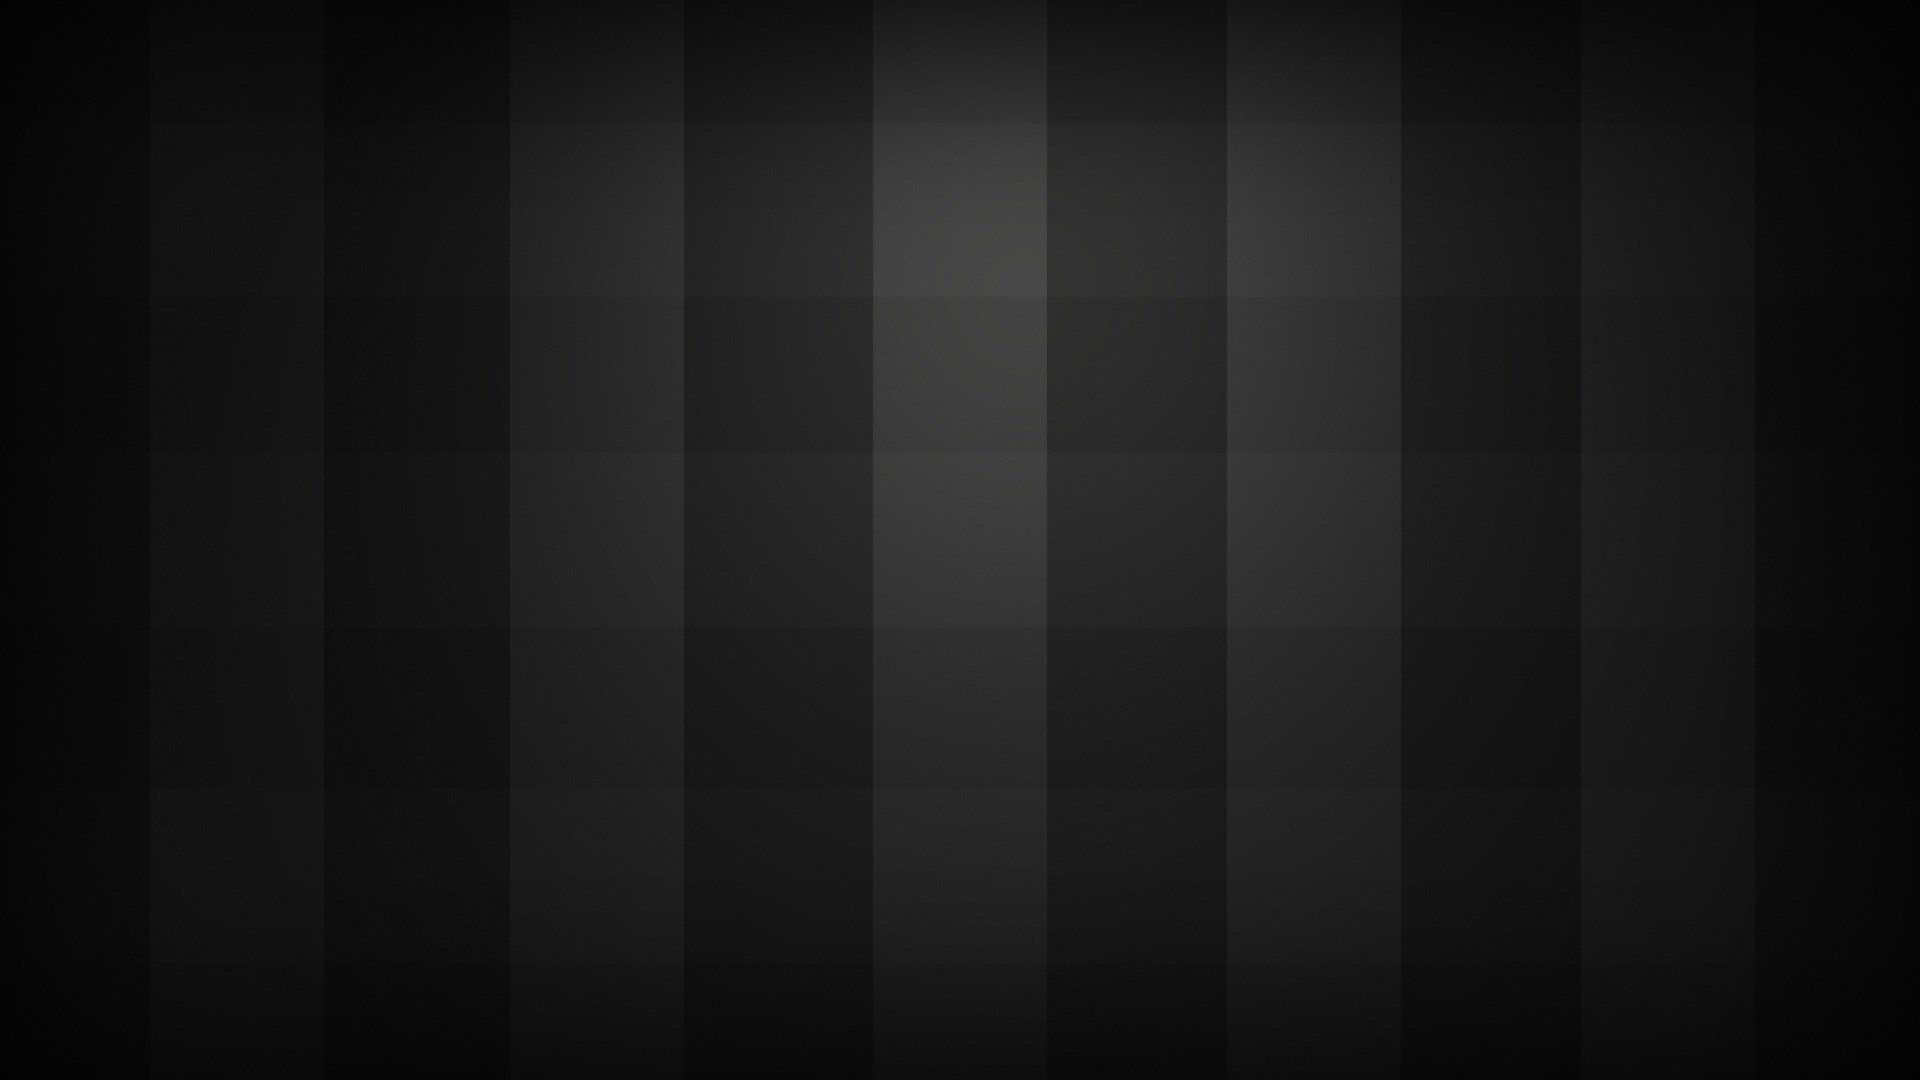 Black Texture Wallpapers Hd Mytwiink Black Texture Wallpapers Hd Mytwiink Black Wallpaper Texture 1920x1080